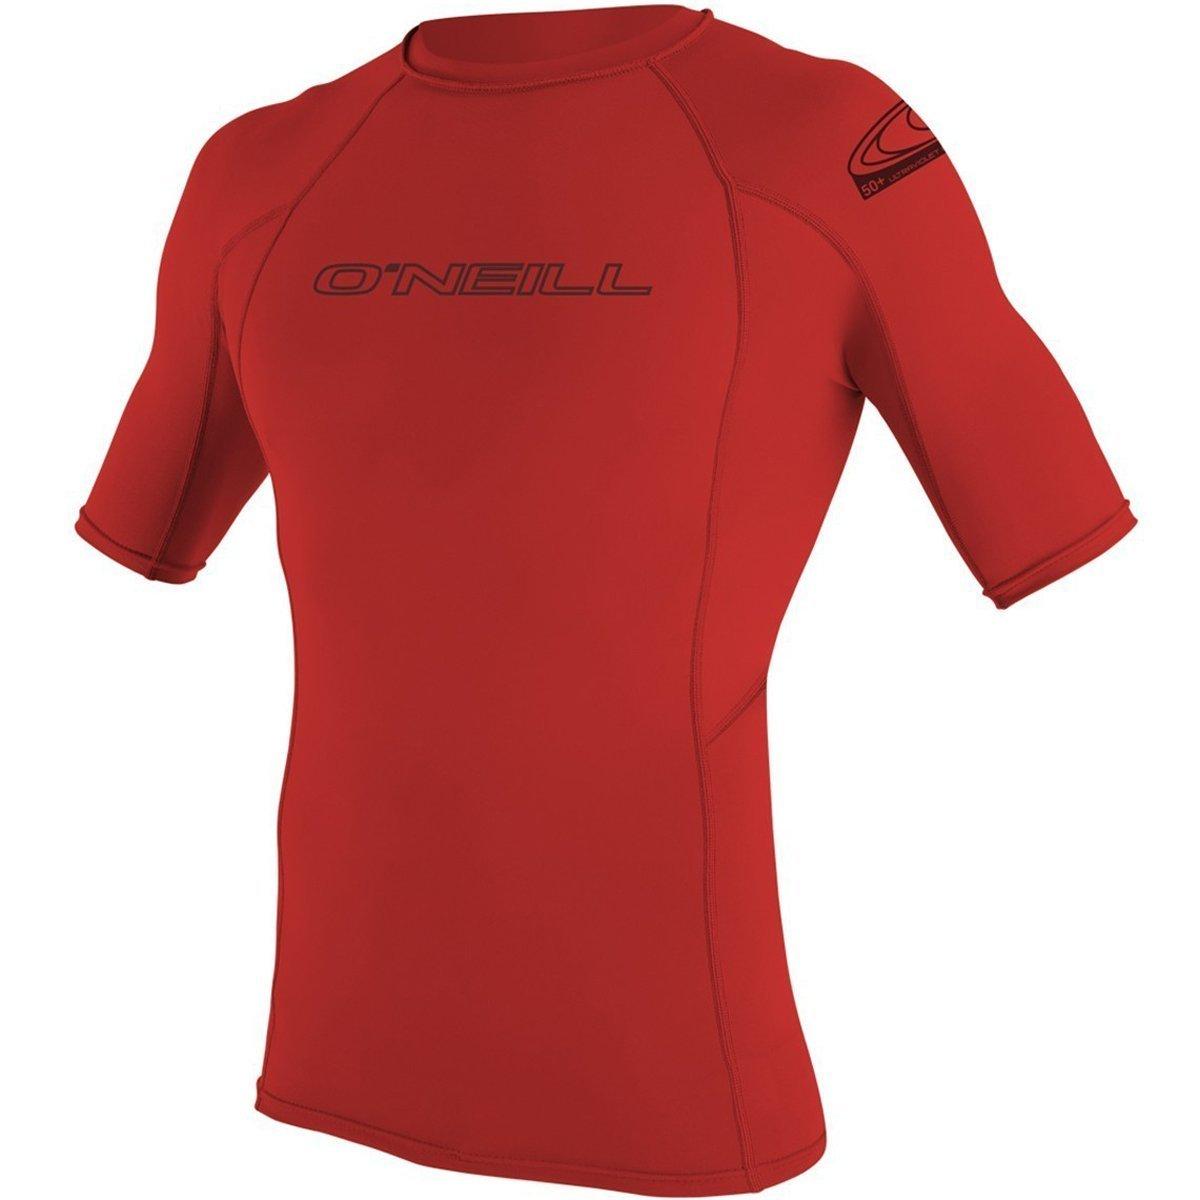 dbd2602f6e2 Amazon.com: O'Neill Men's Basic Skins UPF 50+ Short Sleeve Rash Guard:  Sports & Outdoors